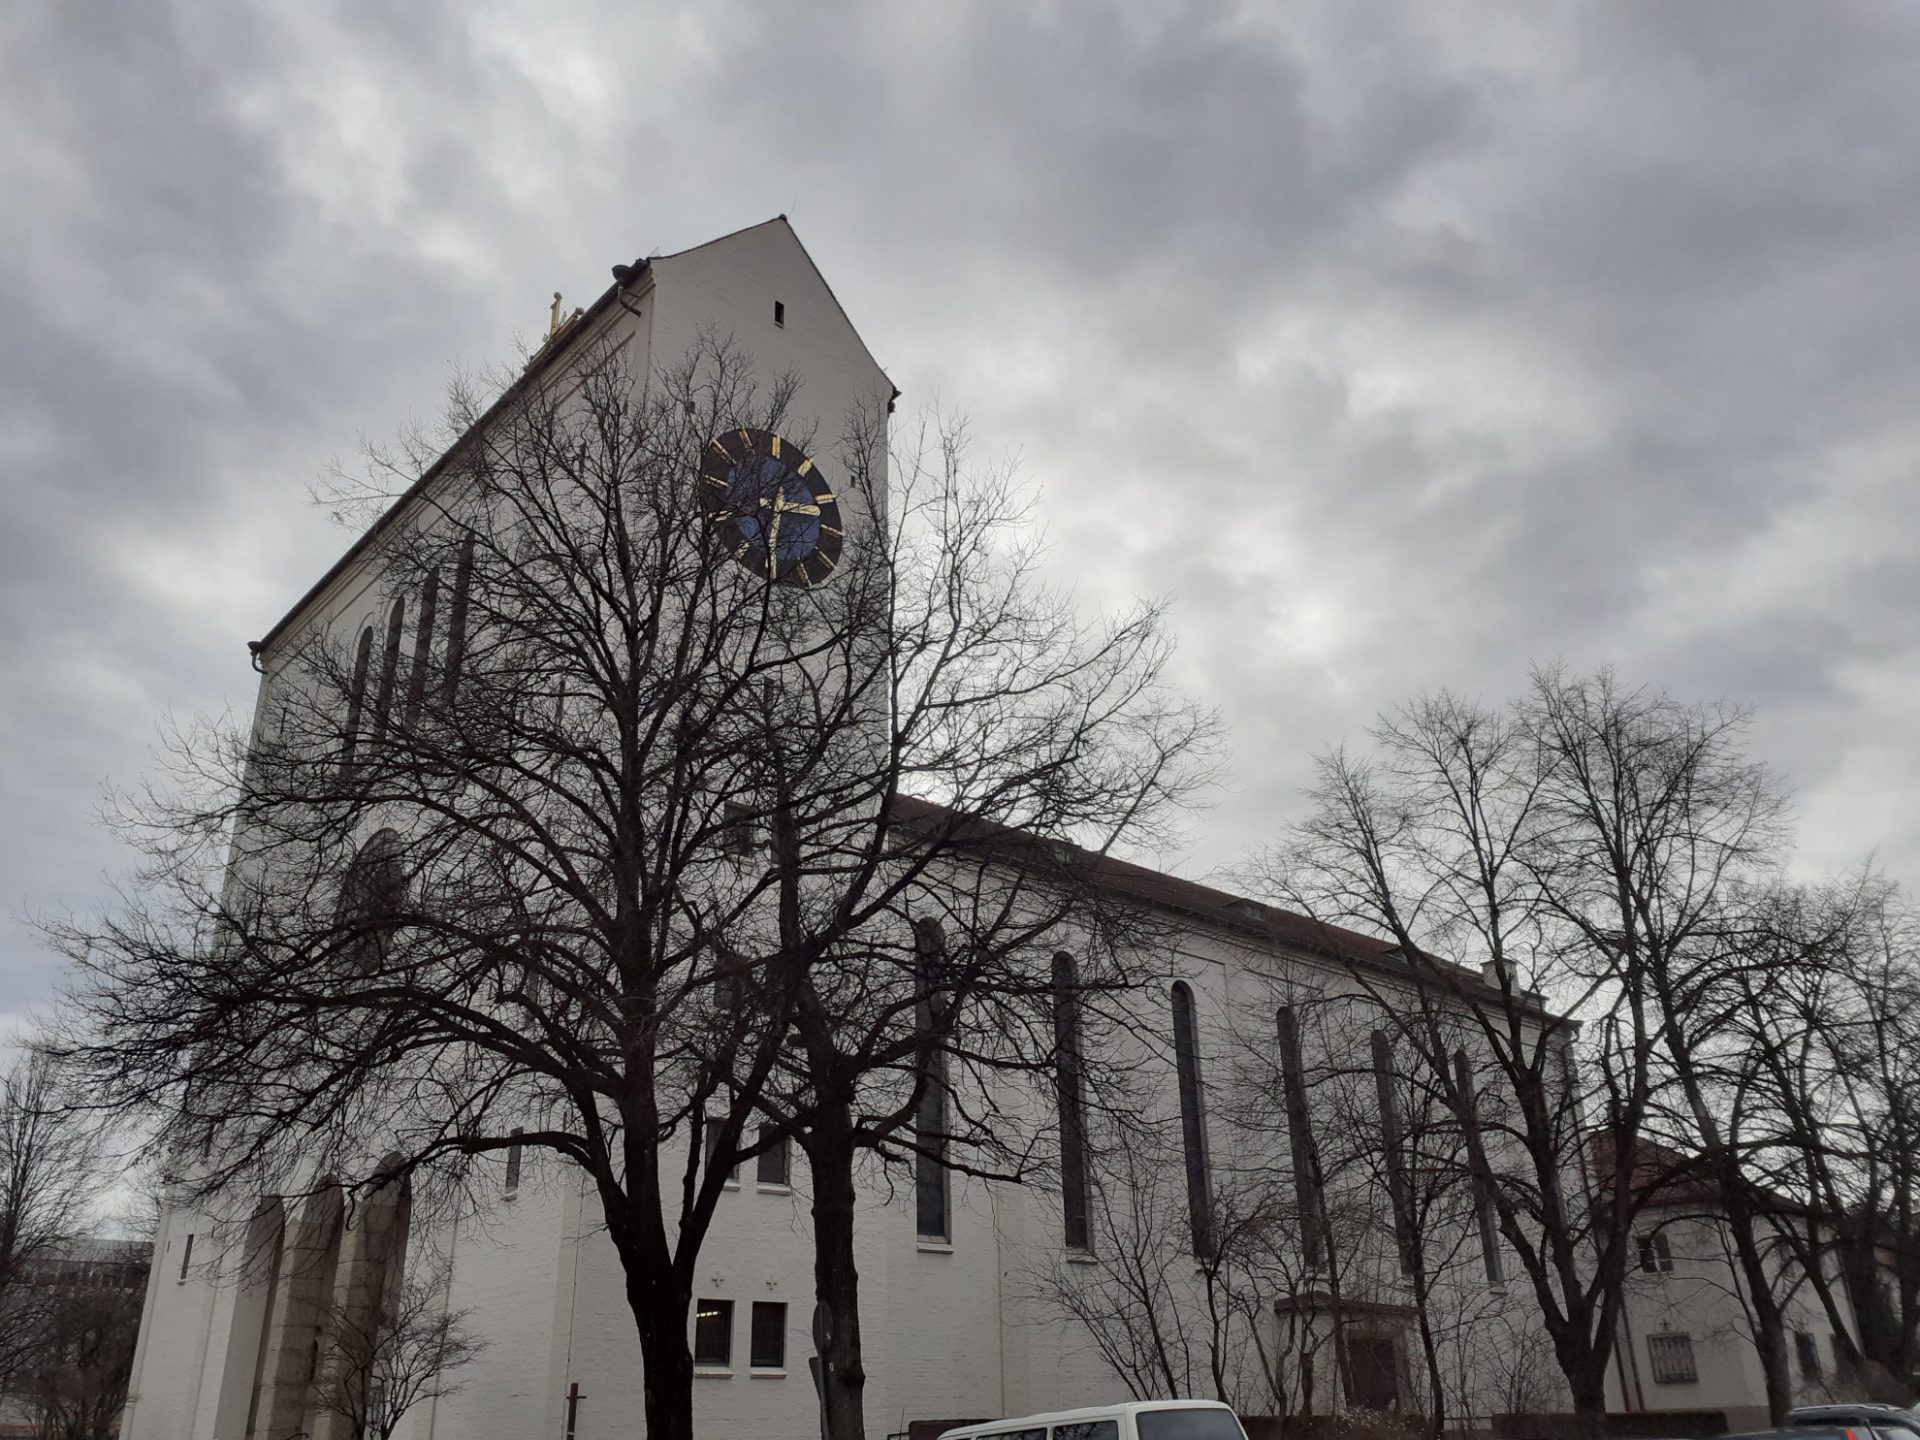 Pfarrkirche St. Pius München-Berg am Laim